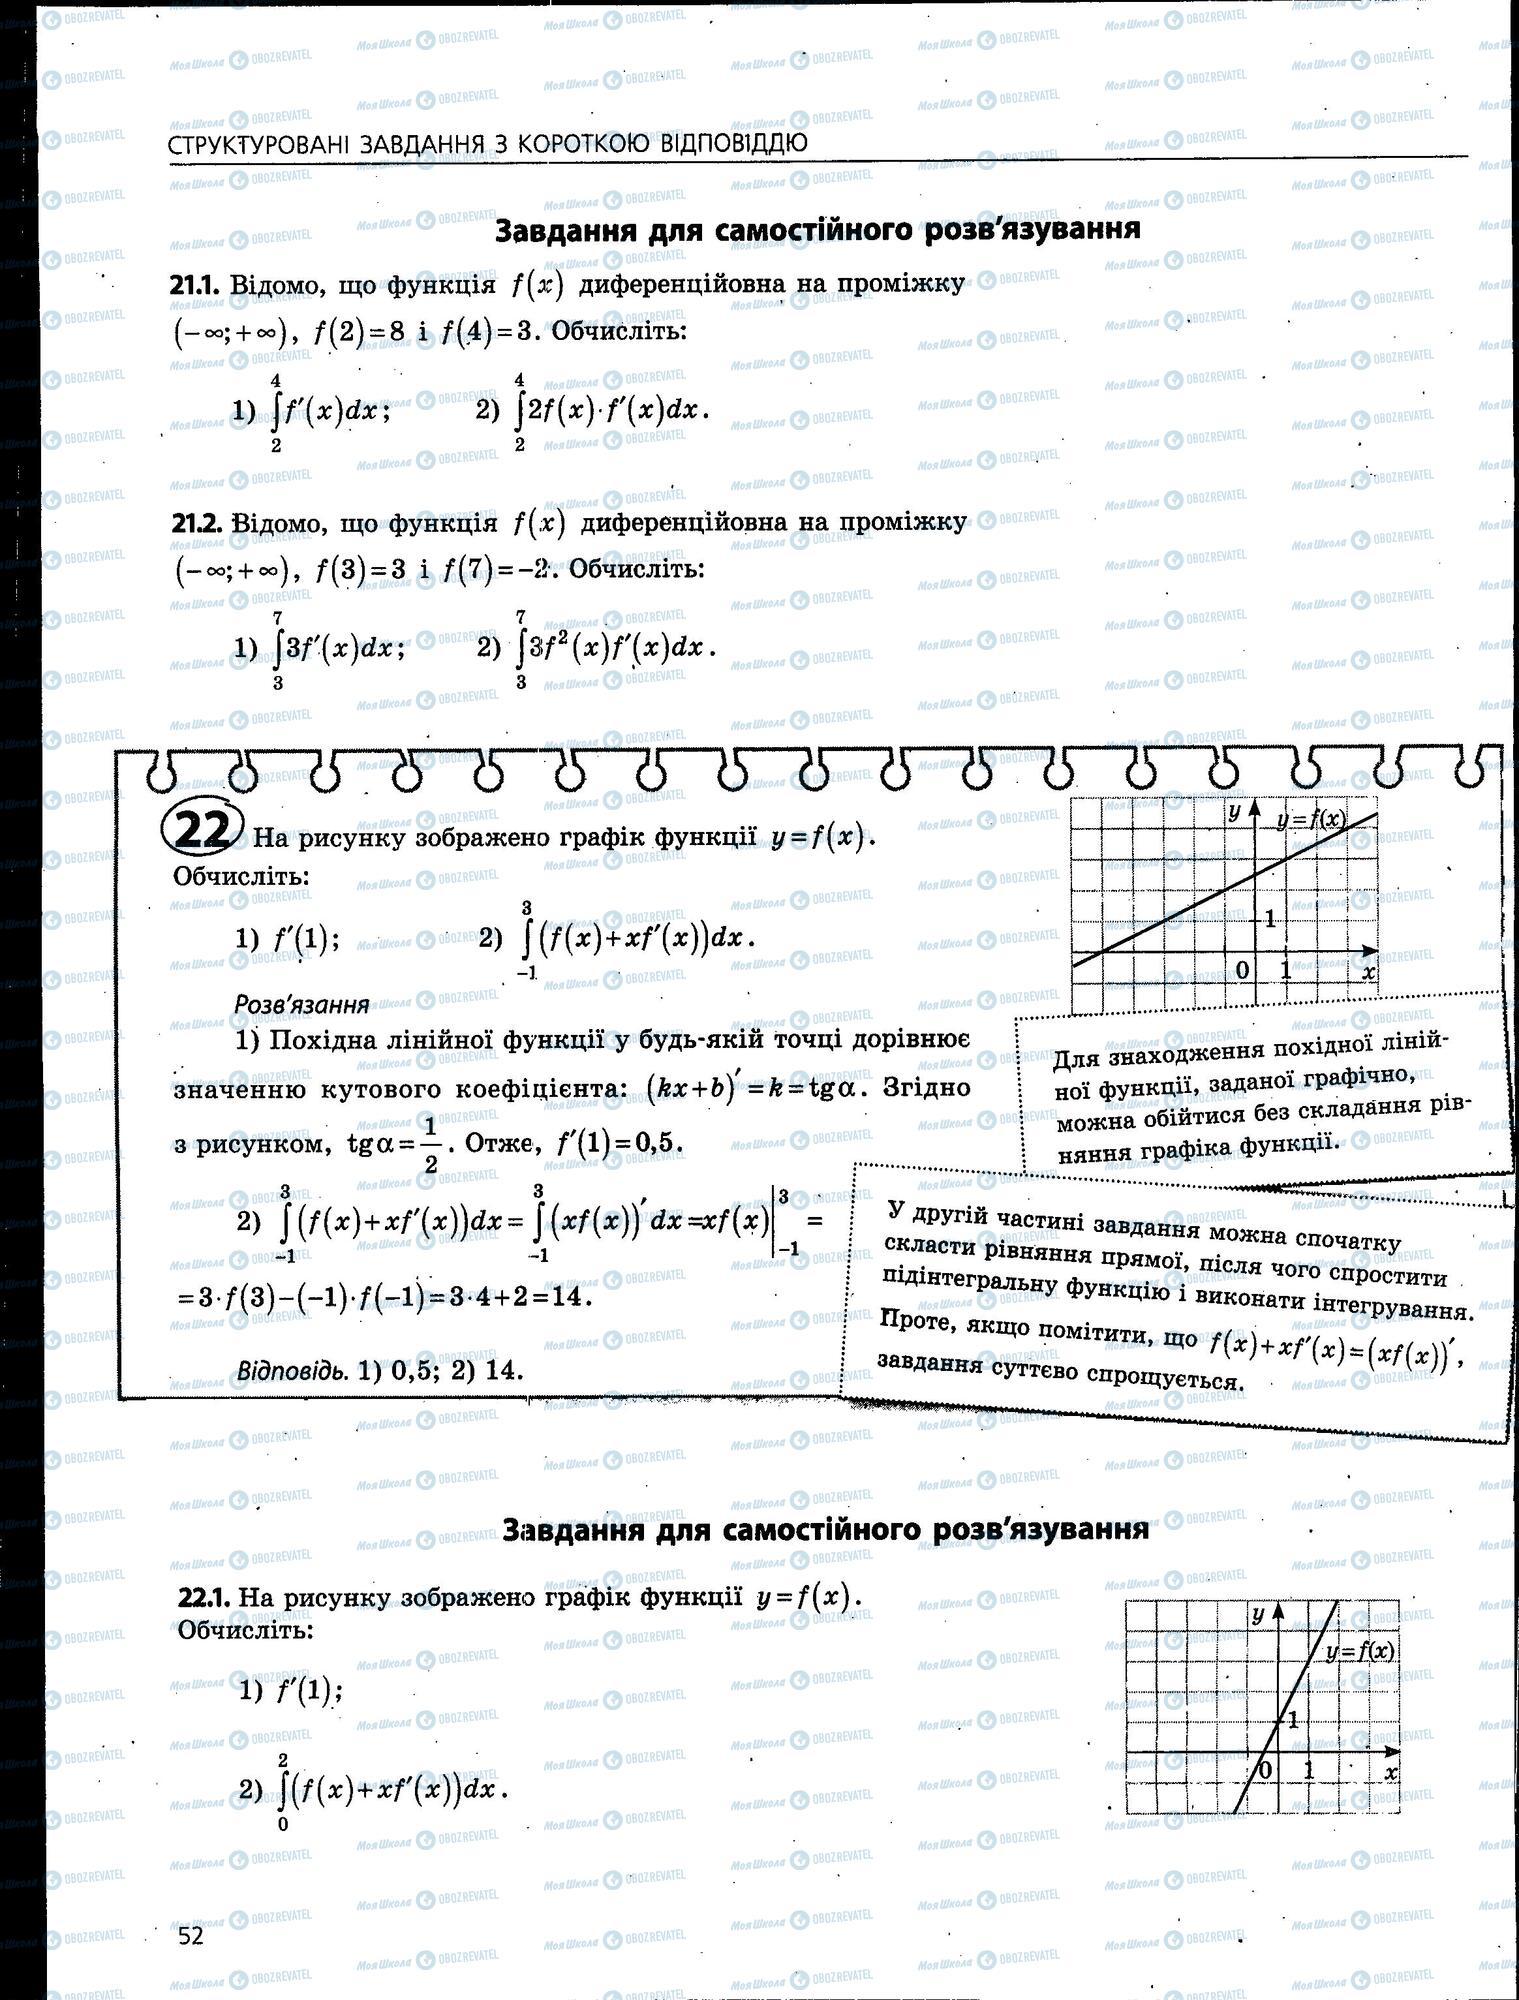 ЗНО Математика 11 класс страница 52